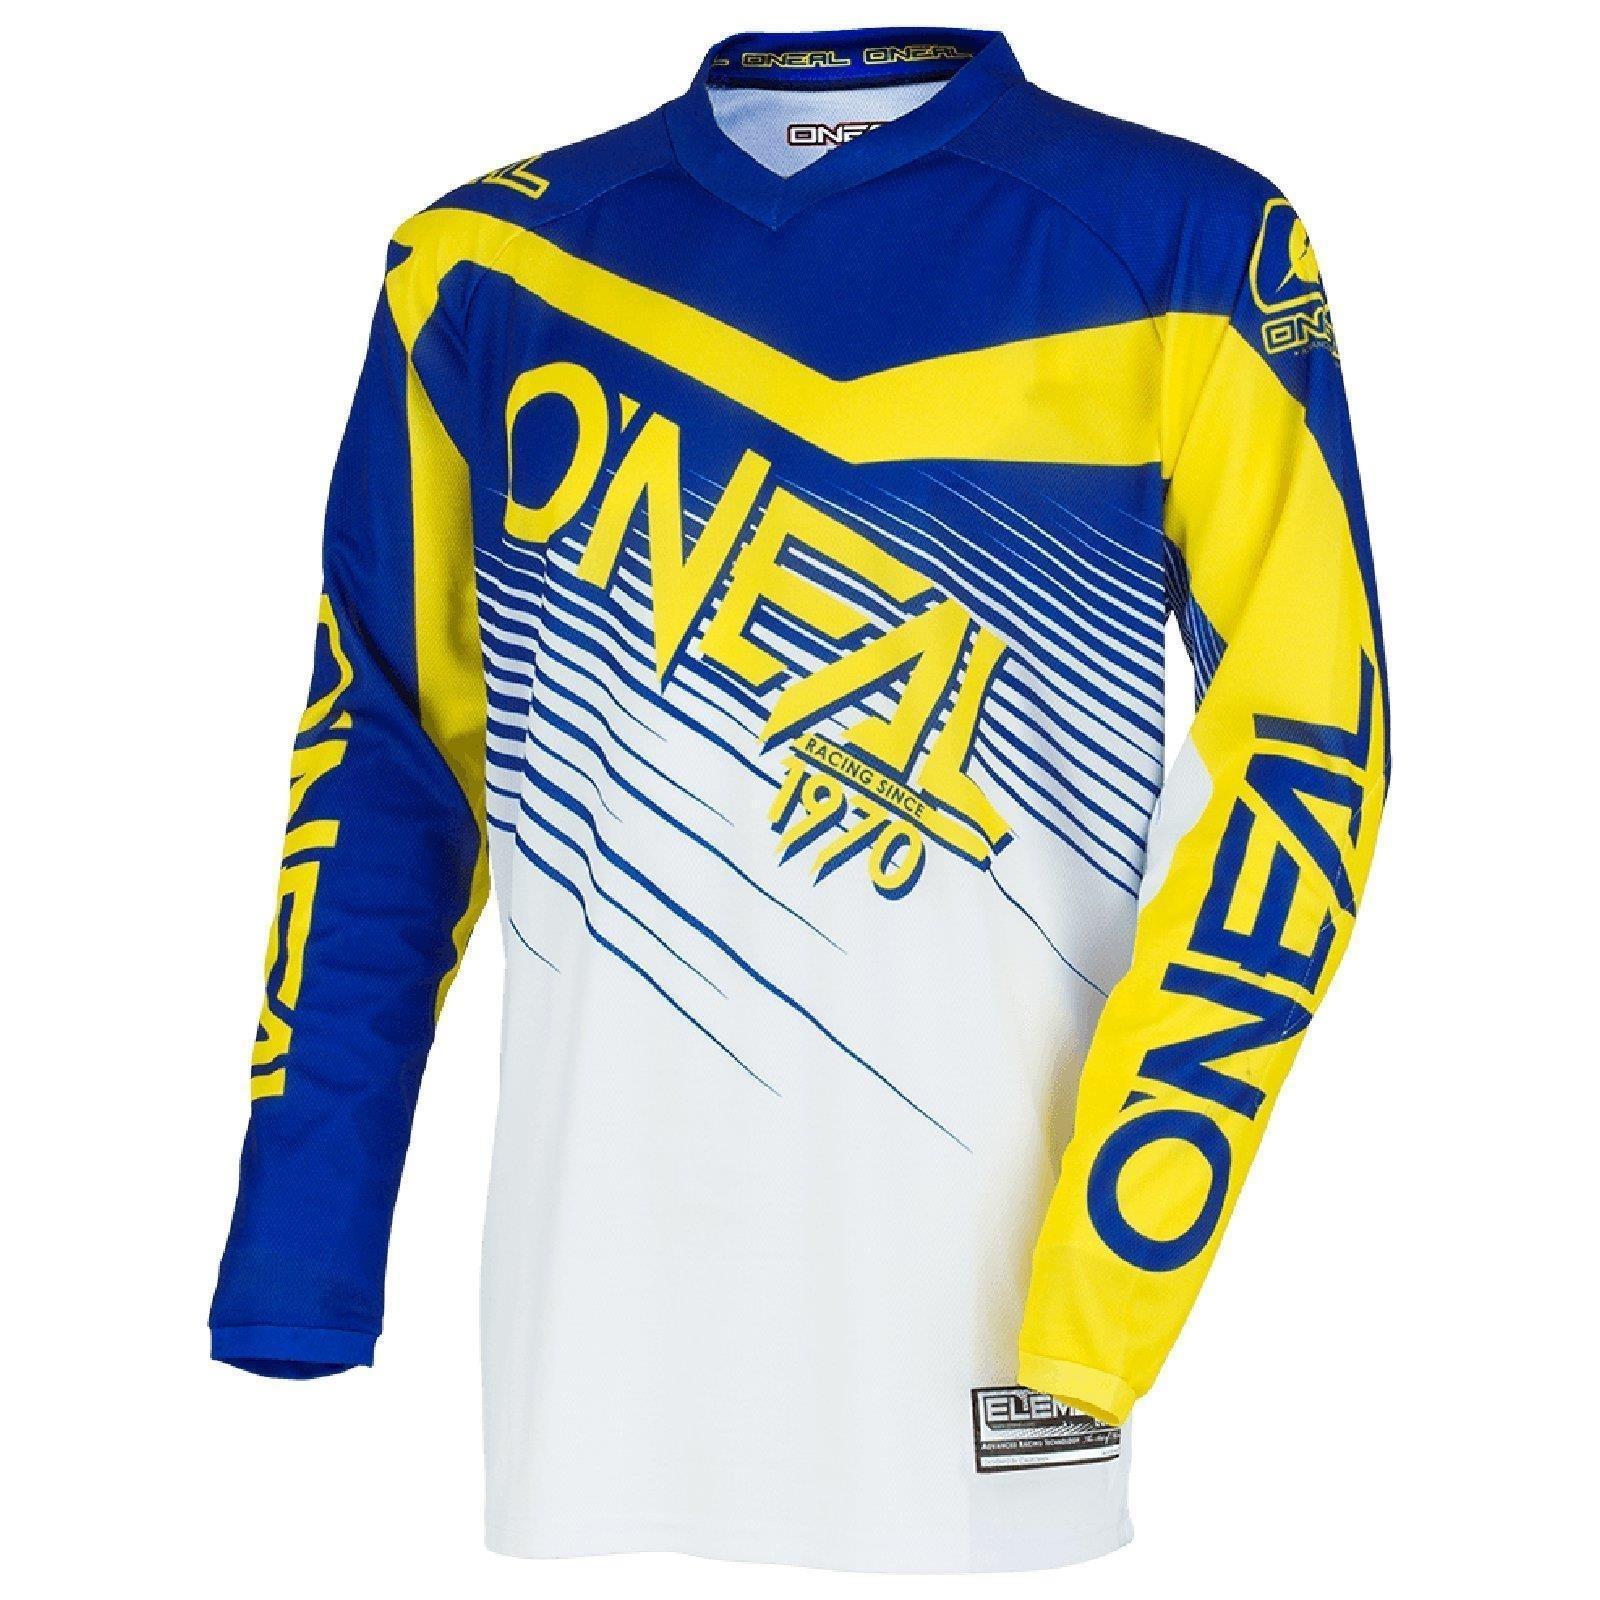 Elemento-oNeal-racewear-Jersey-pantalones-a-ninos-adulto-Motocross-Enduro-downhill miniatura 21